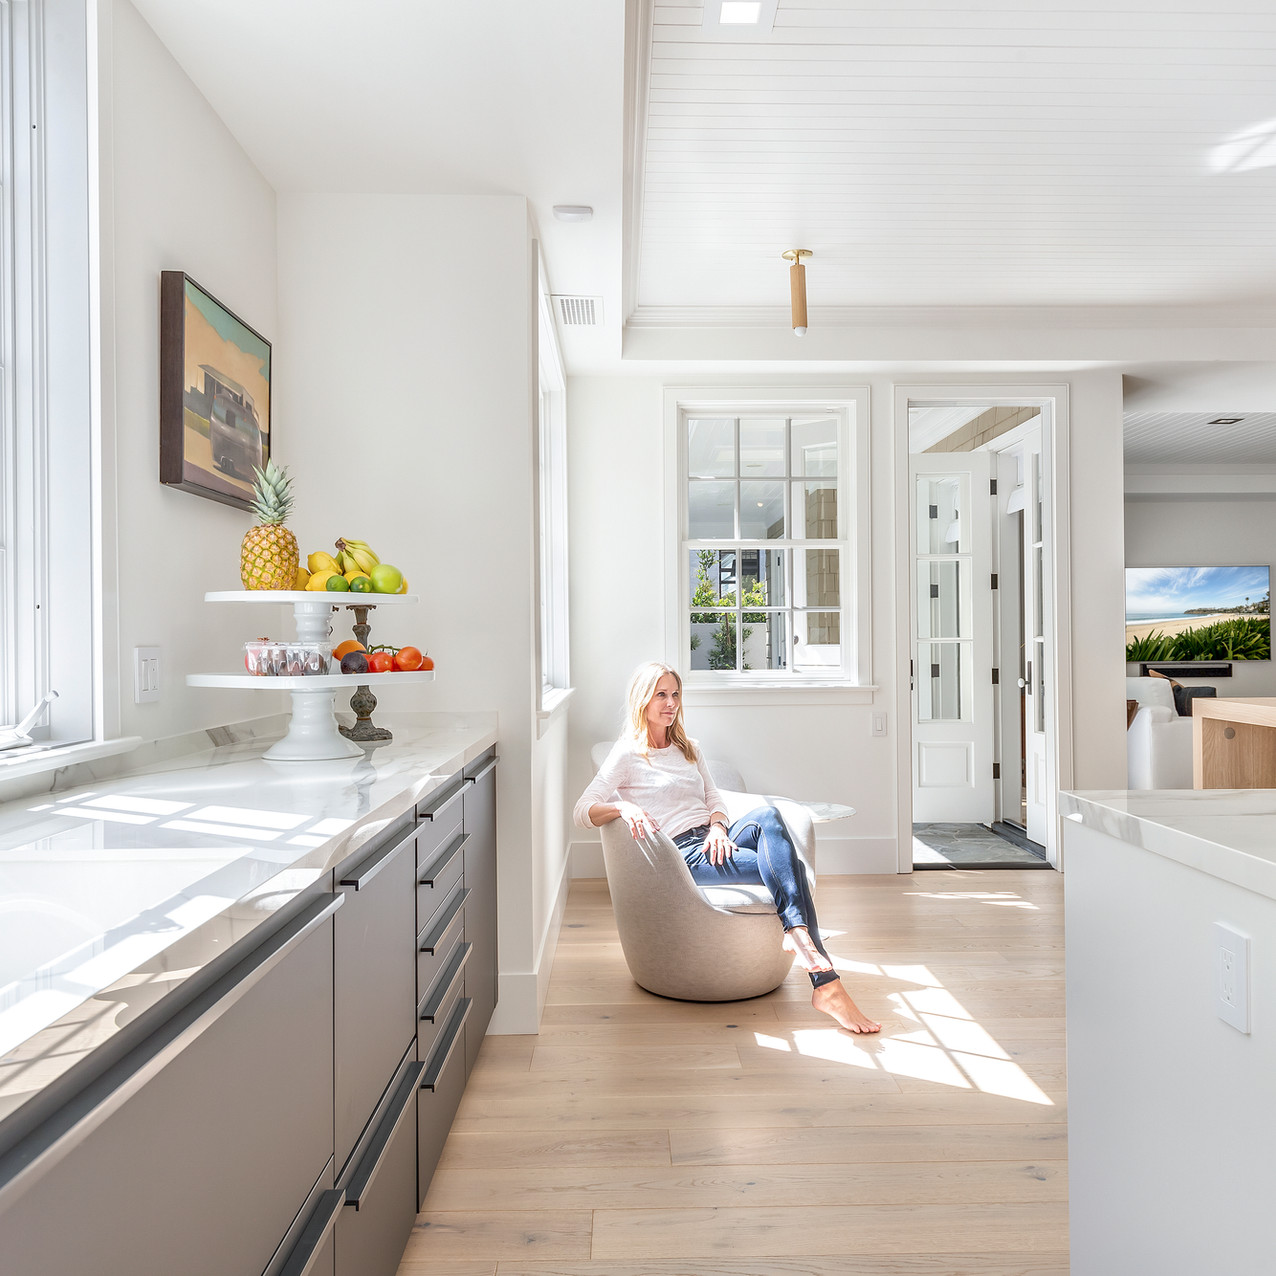 Cape Cod style home - Bondi and Synthia